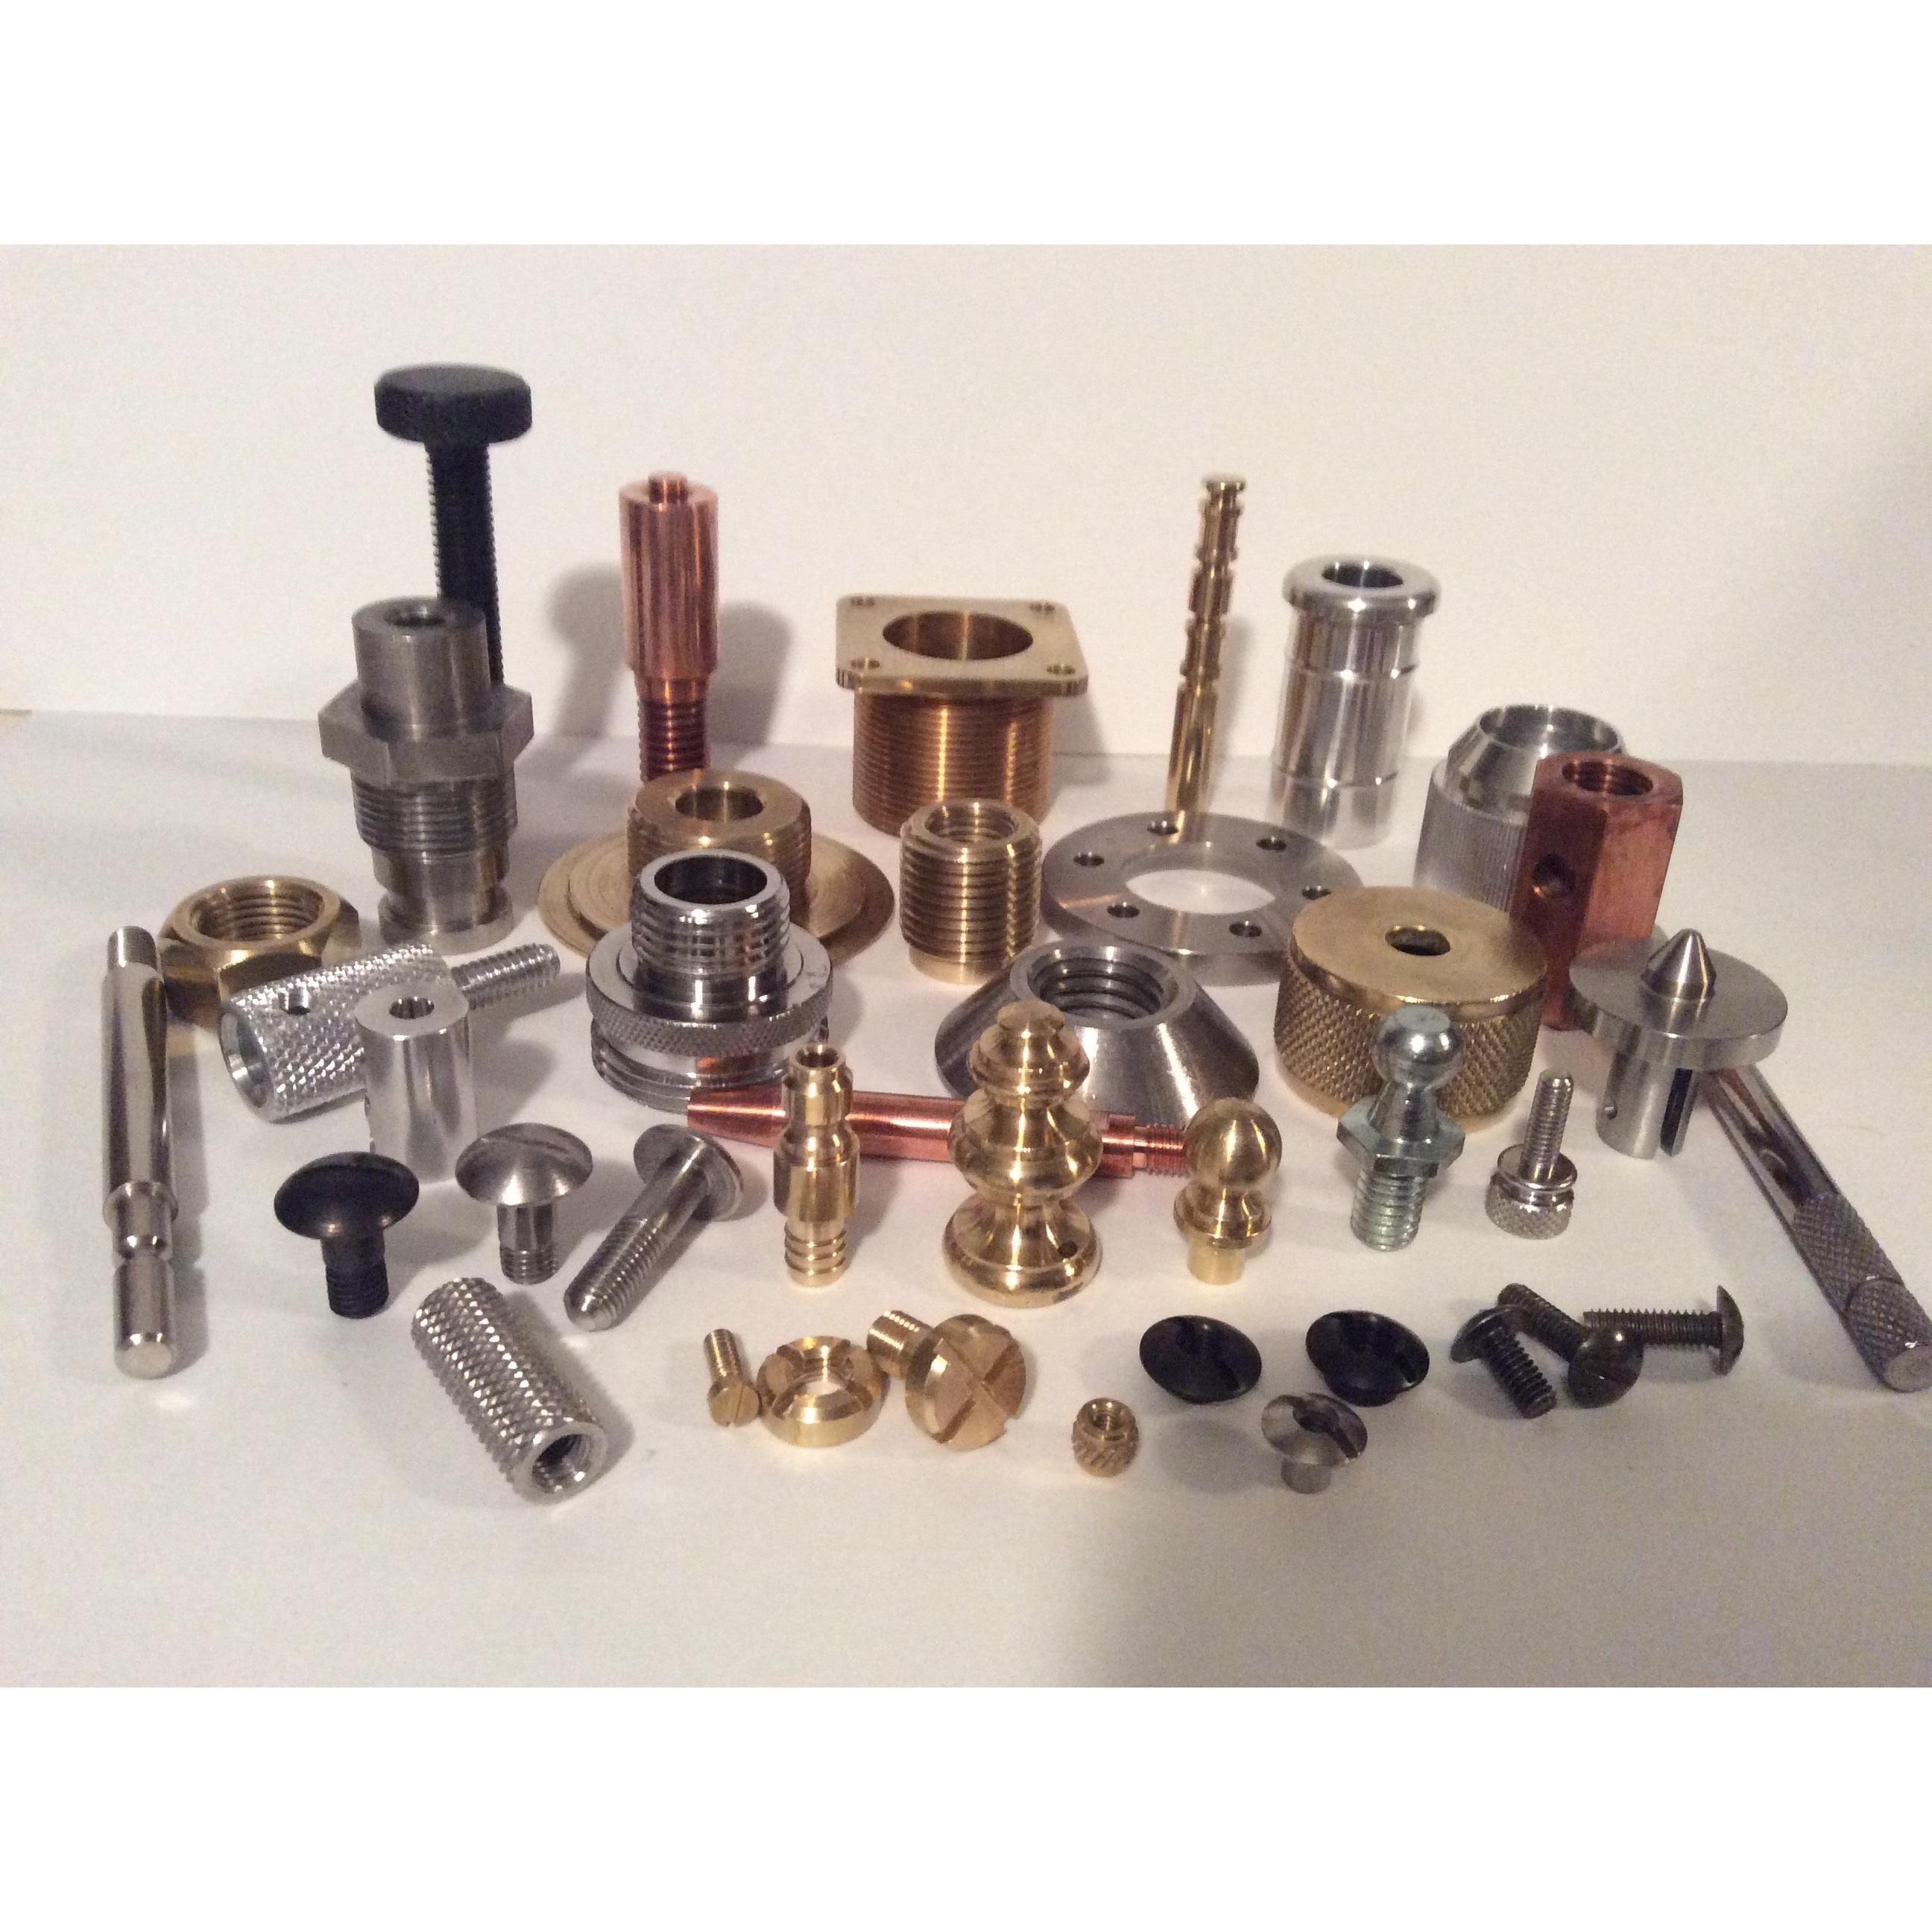 Norwood Screw Machine Parts Inc